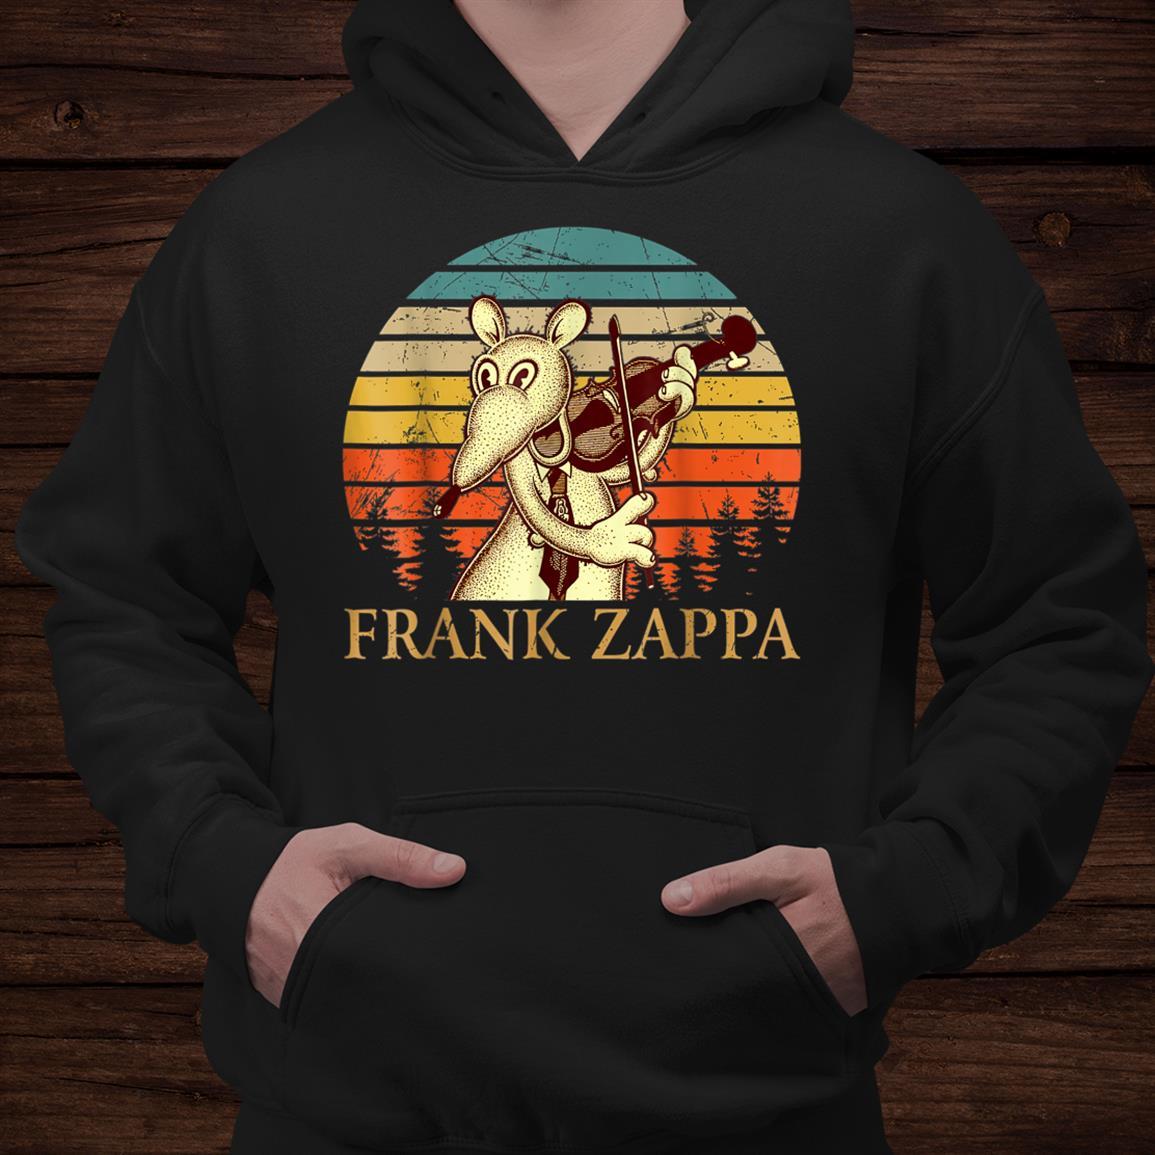 Frank Zap.pa Love Guitar Musical Legends0s Vintage Shirt